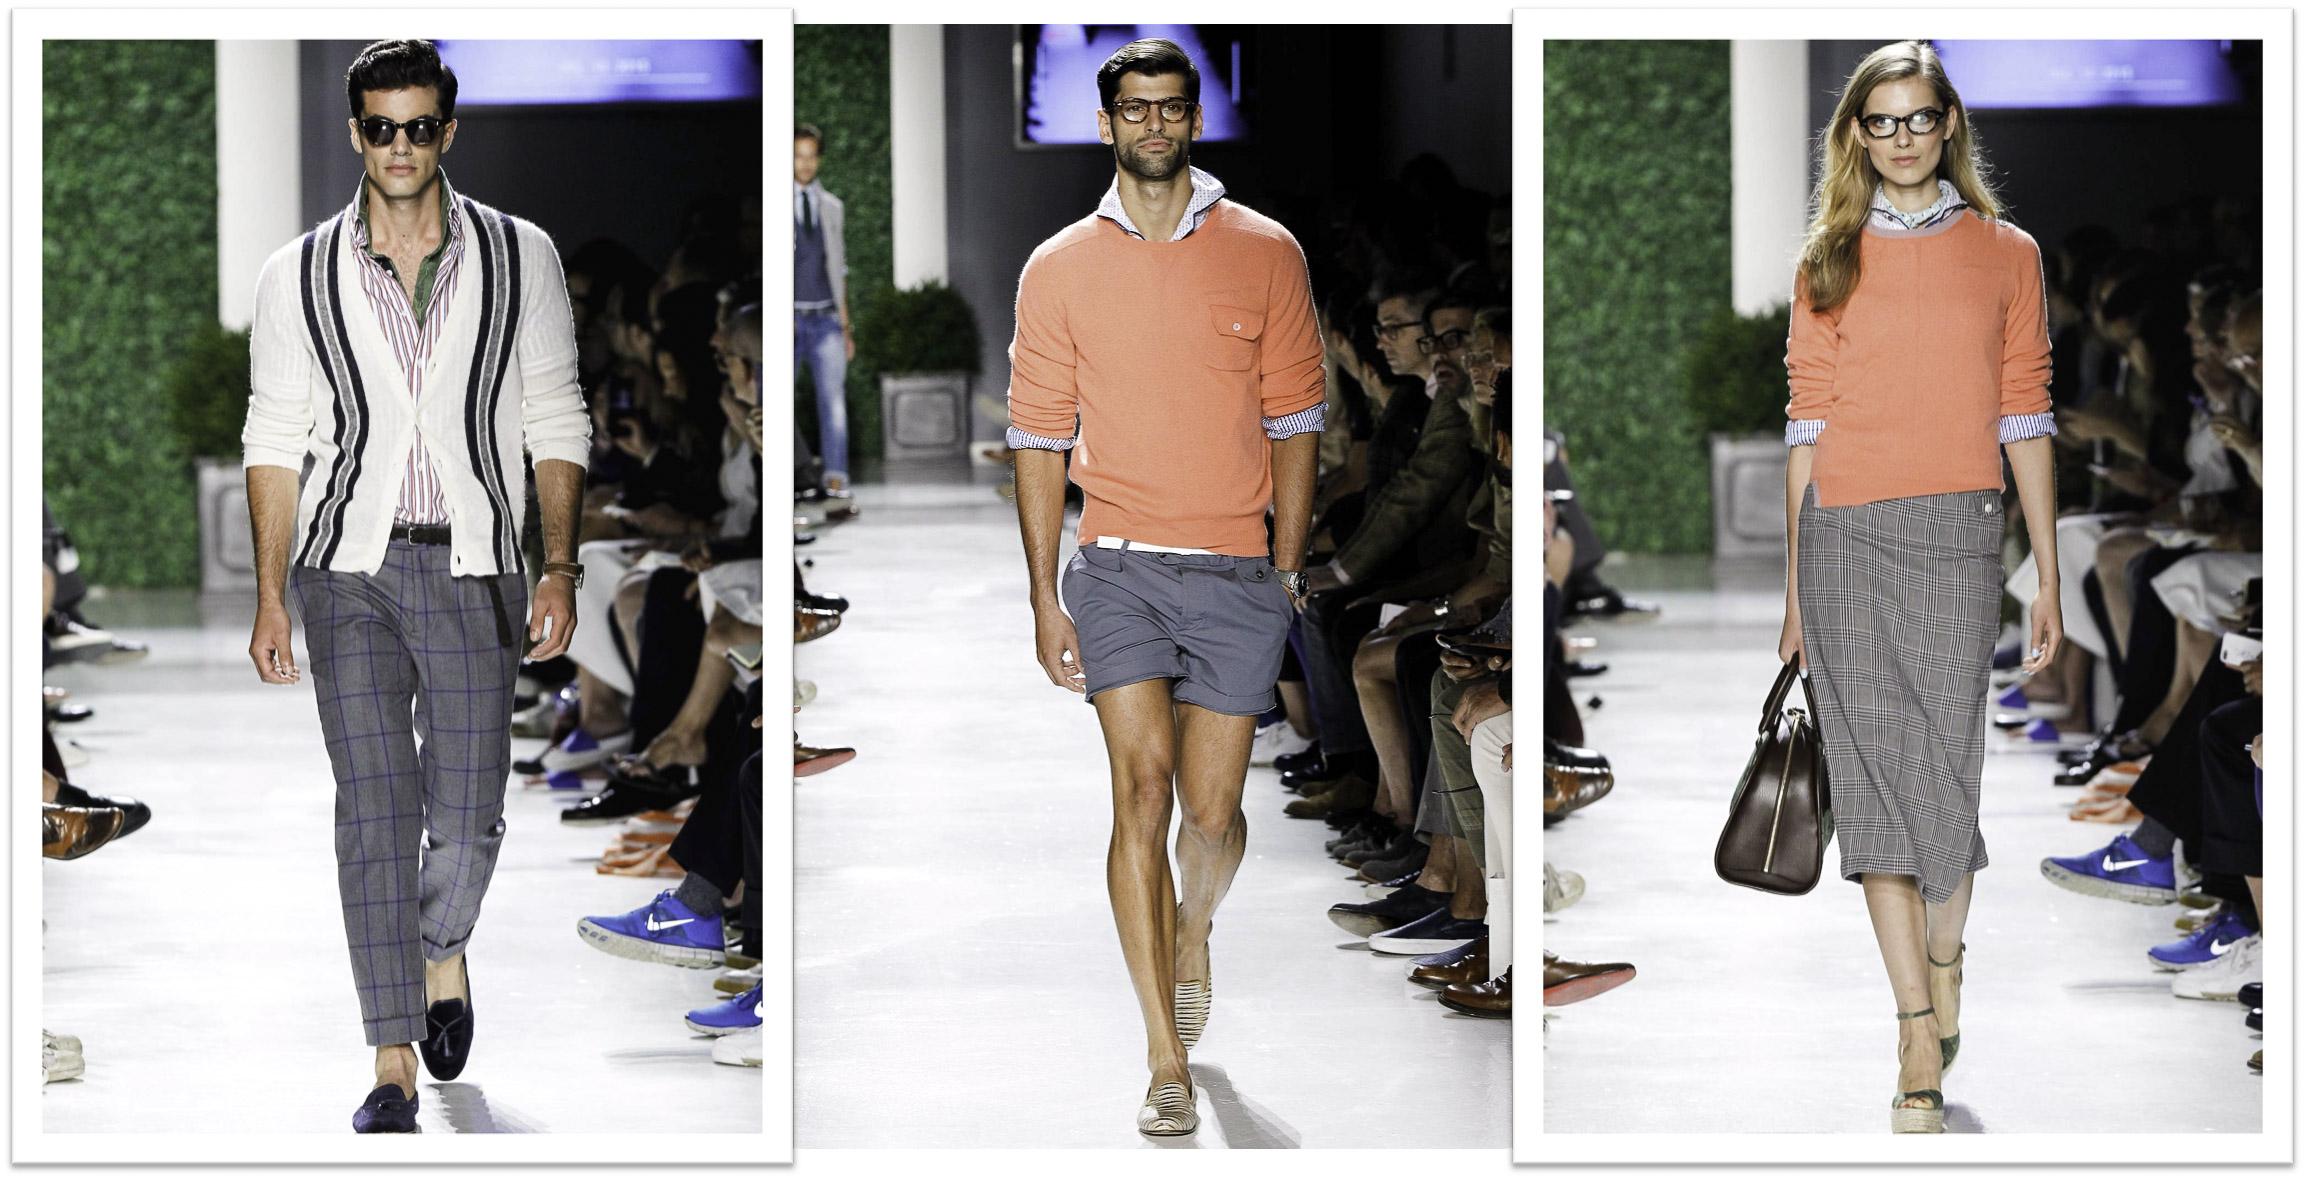 top-menswear-bloggers-2015_michael-bastian-spring-2016-menswear_top-fashion-bloggers-melbourne-australia-6